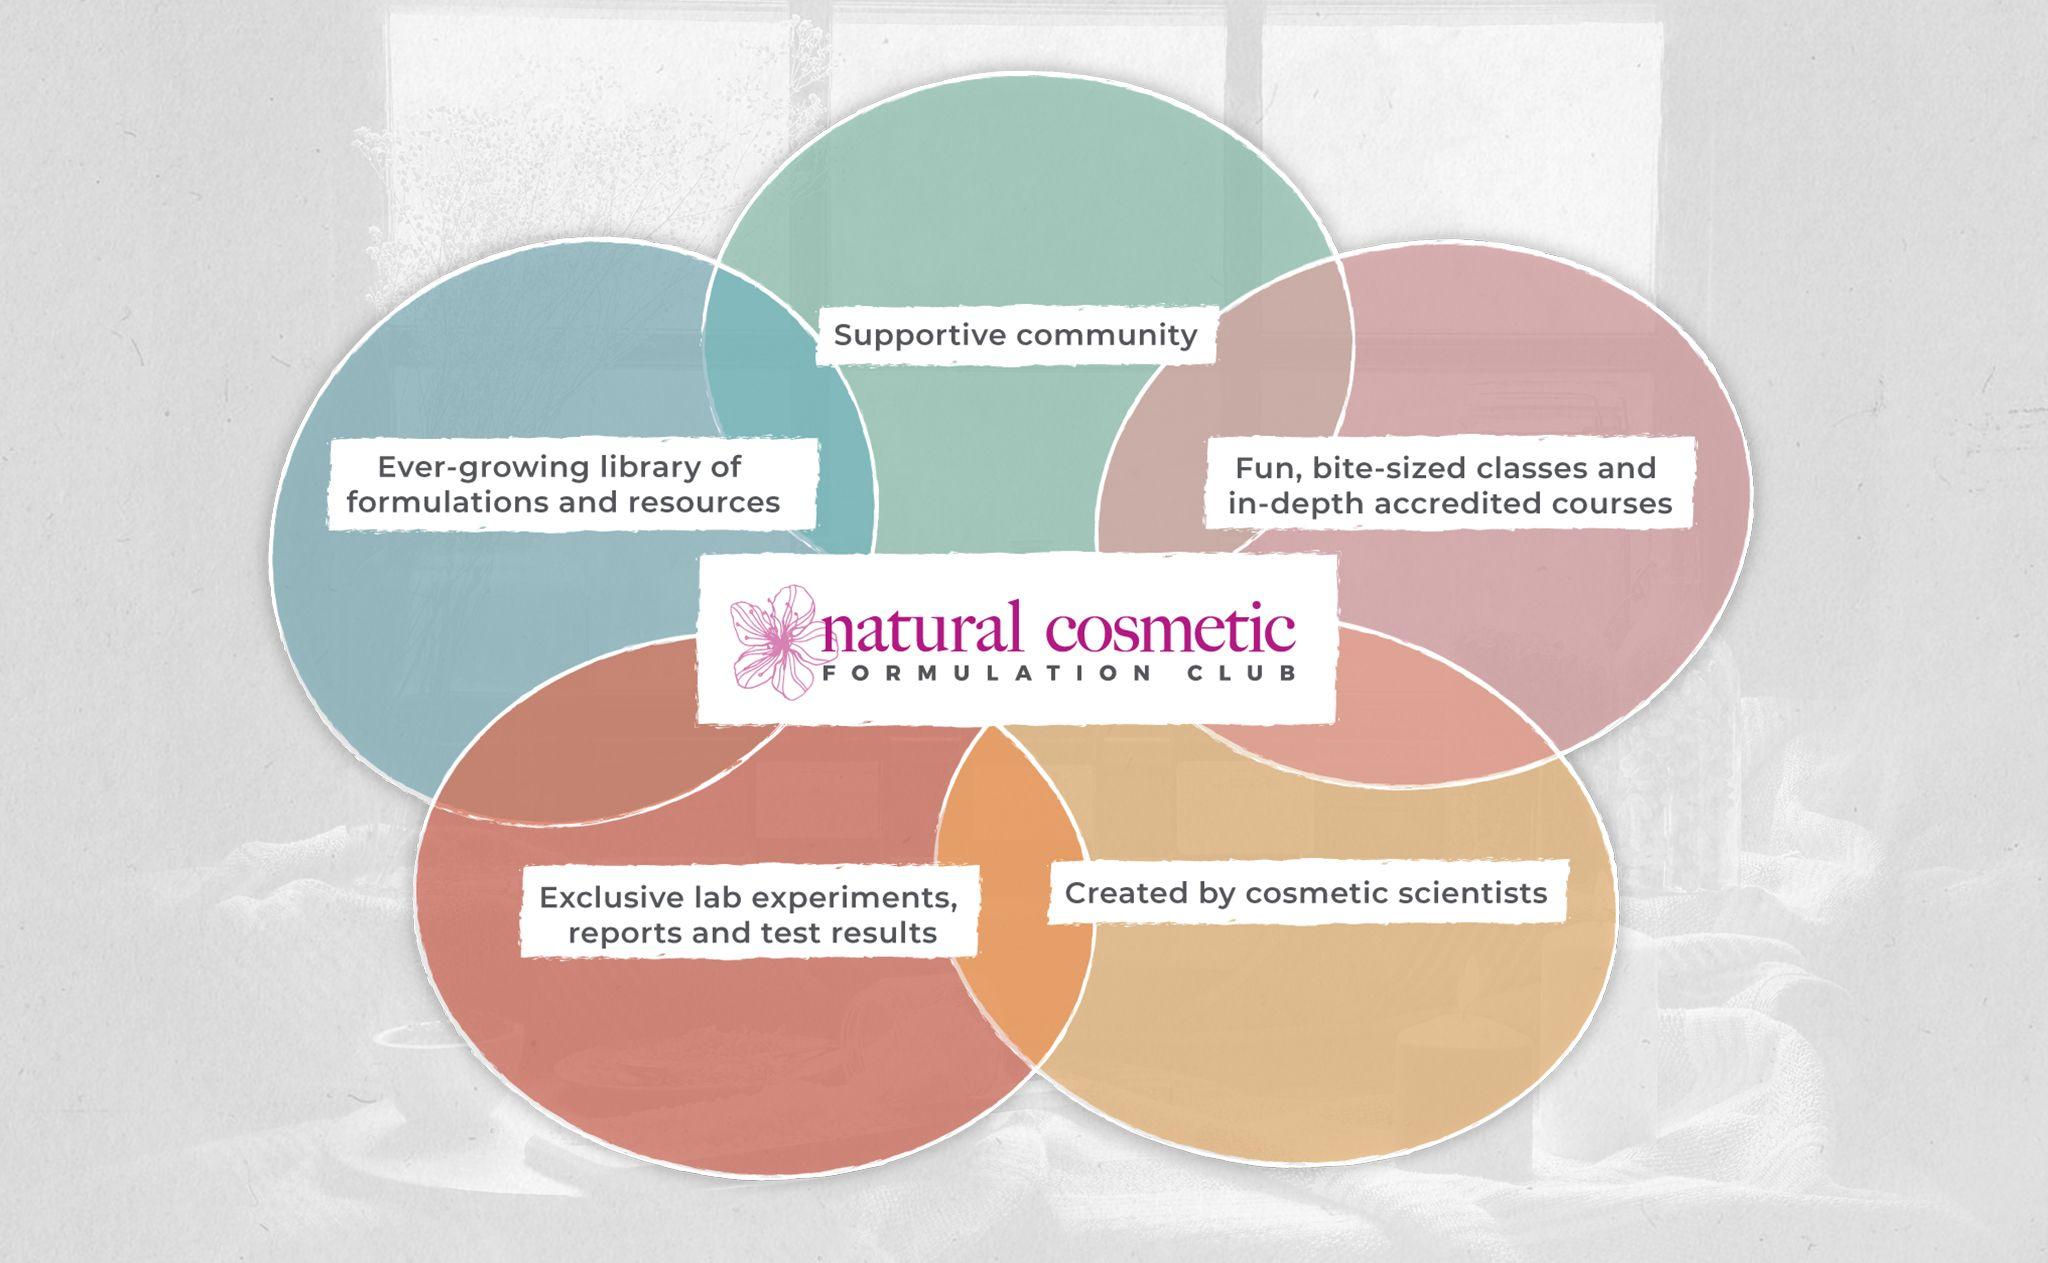 Natural Cosmetic Formulation Club